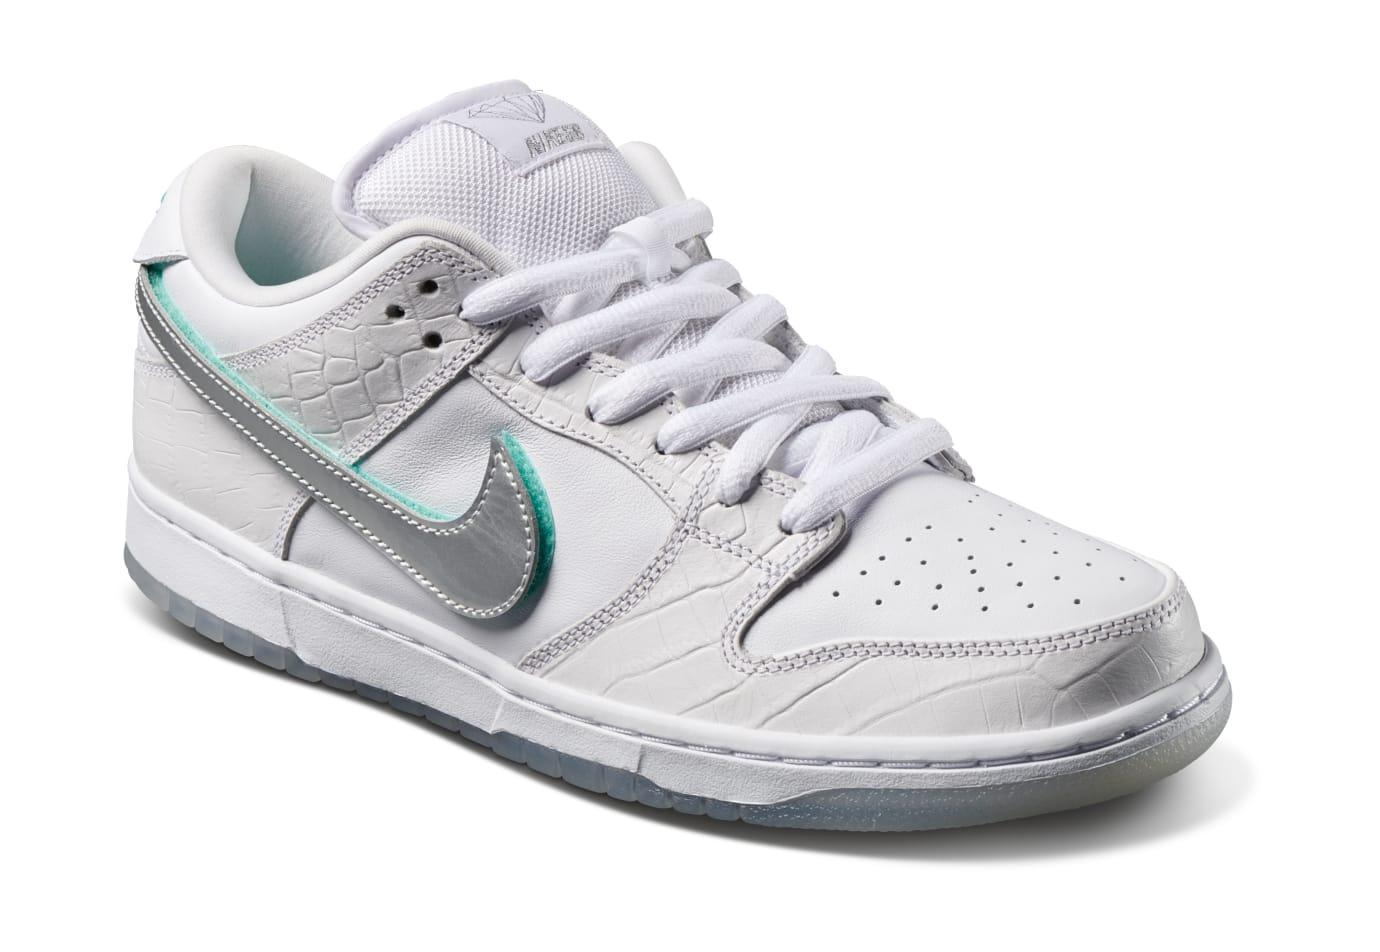 Diamond Supply Co. x Nike SB Dunk Low 'White' (Front)